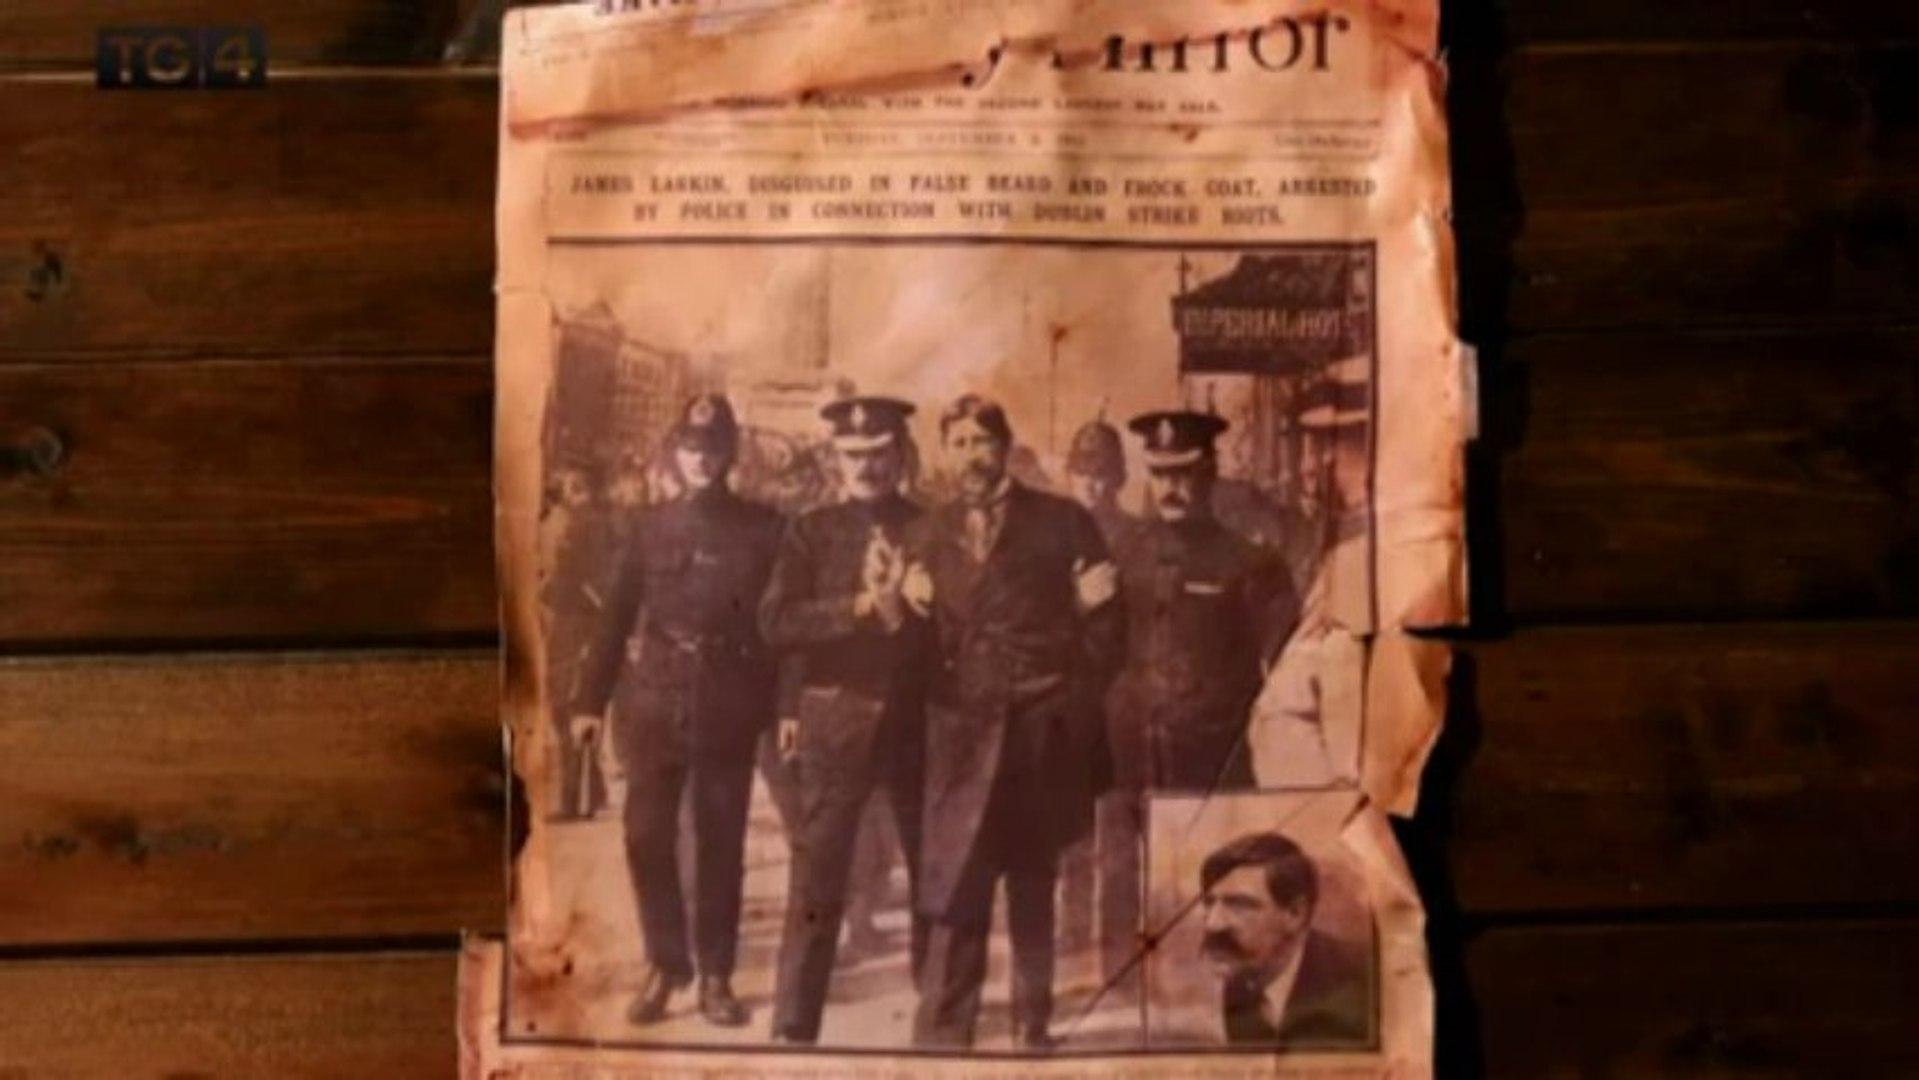 1916 Seachtar Dearmadta - The Forgotten Seven 1- Michael Mallin